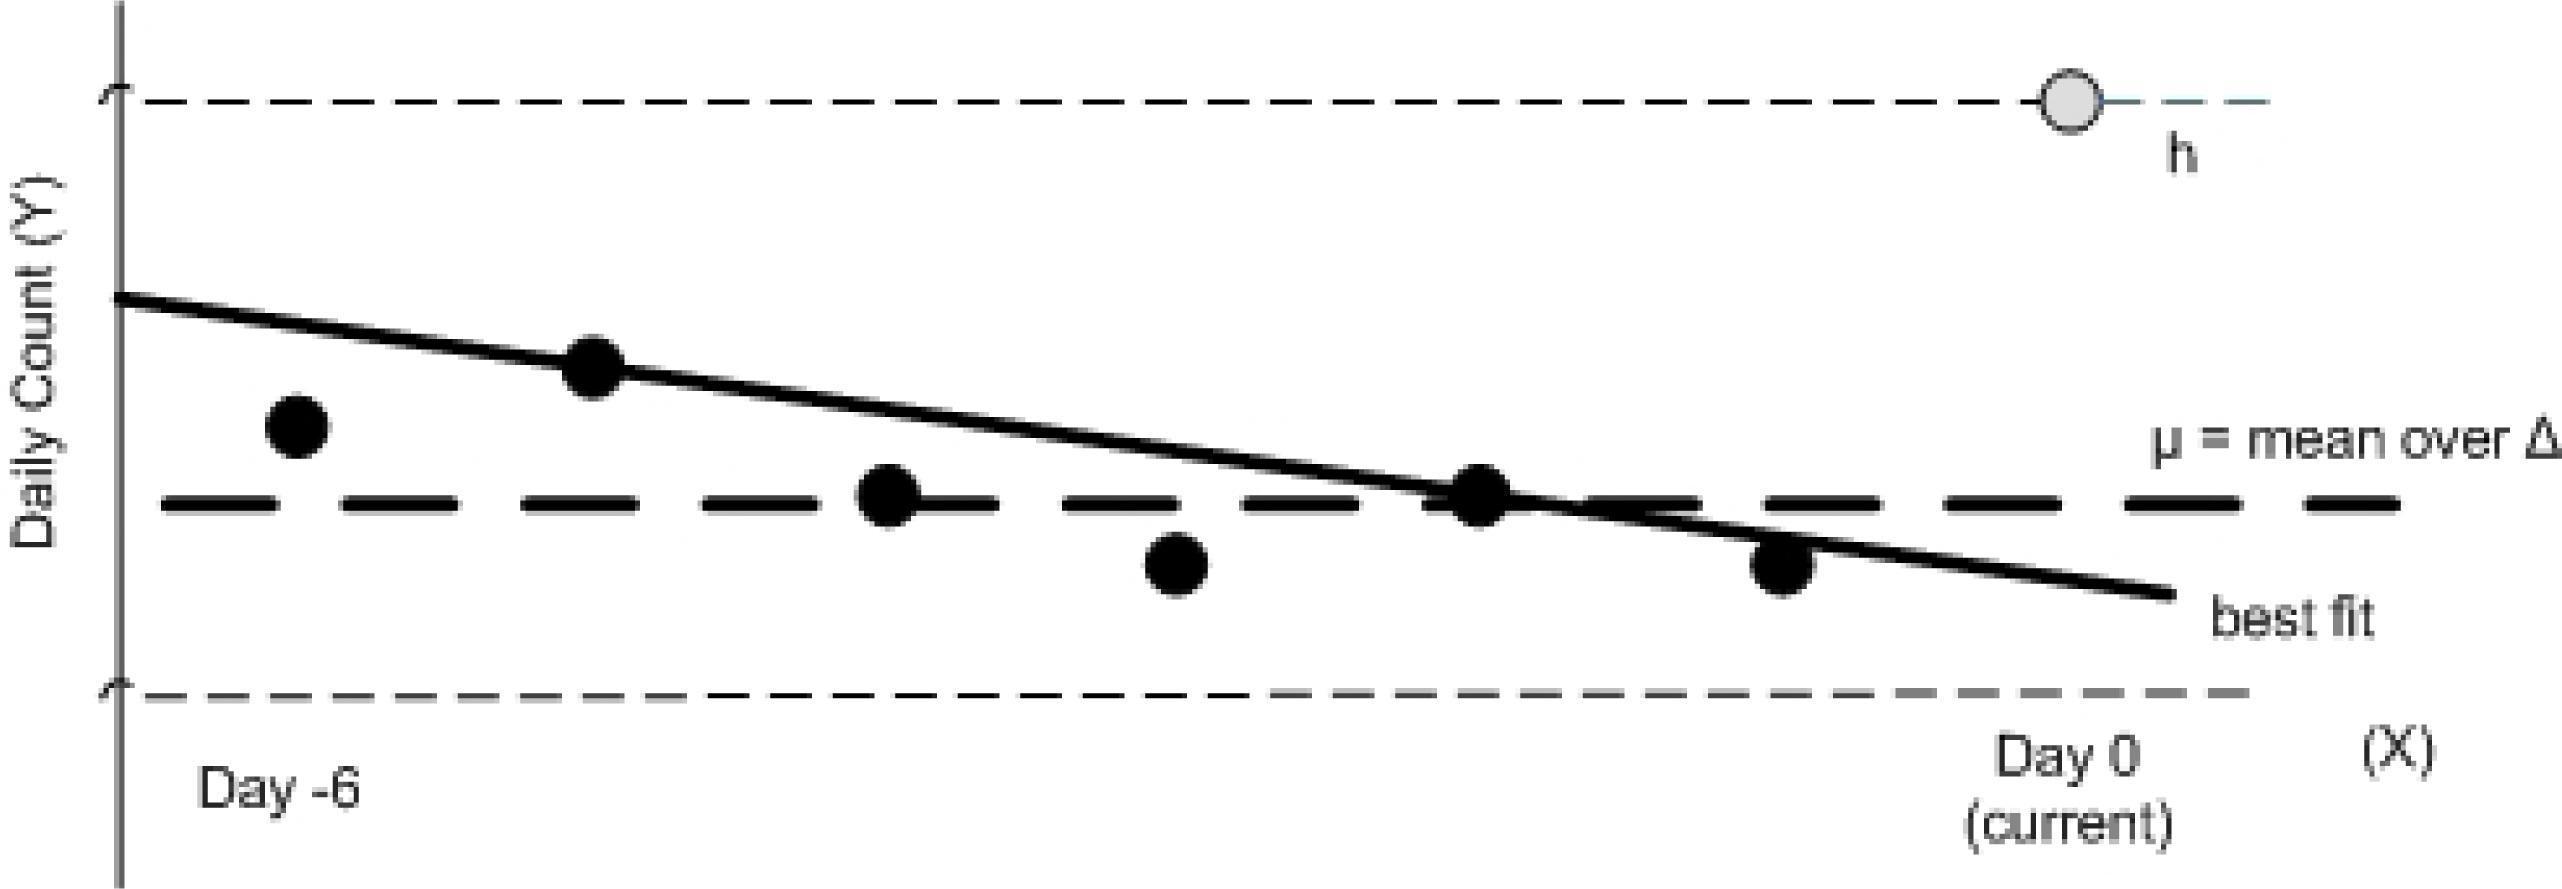 ojphi-02-3f7.tif